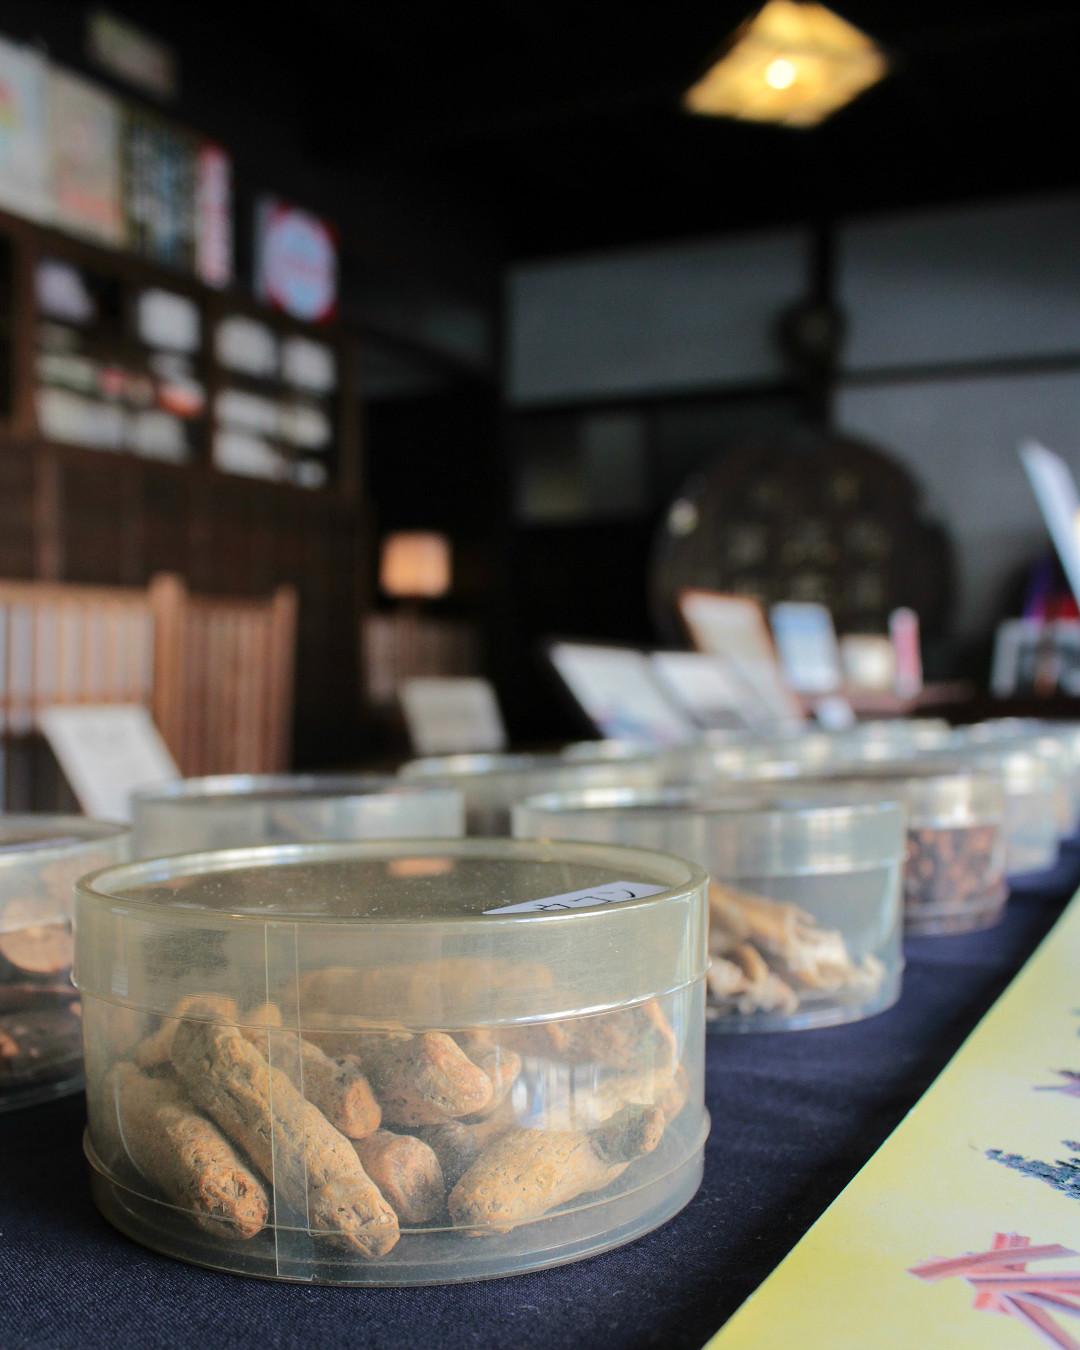 Chinese pharmacy, Shinise Kinenkan in the samurai district of Nagamachi in Kanazawa, Japan